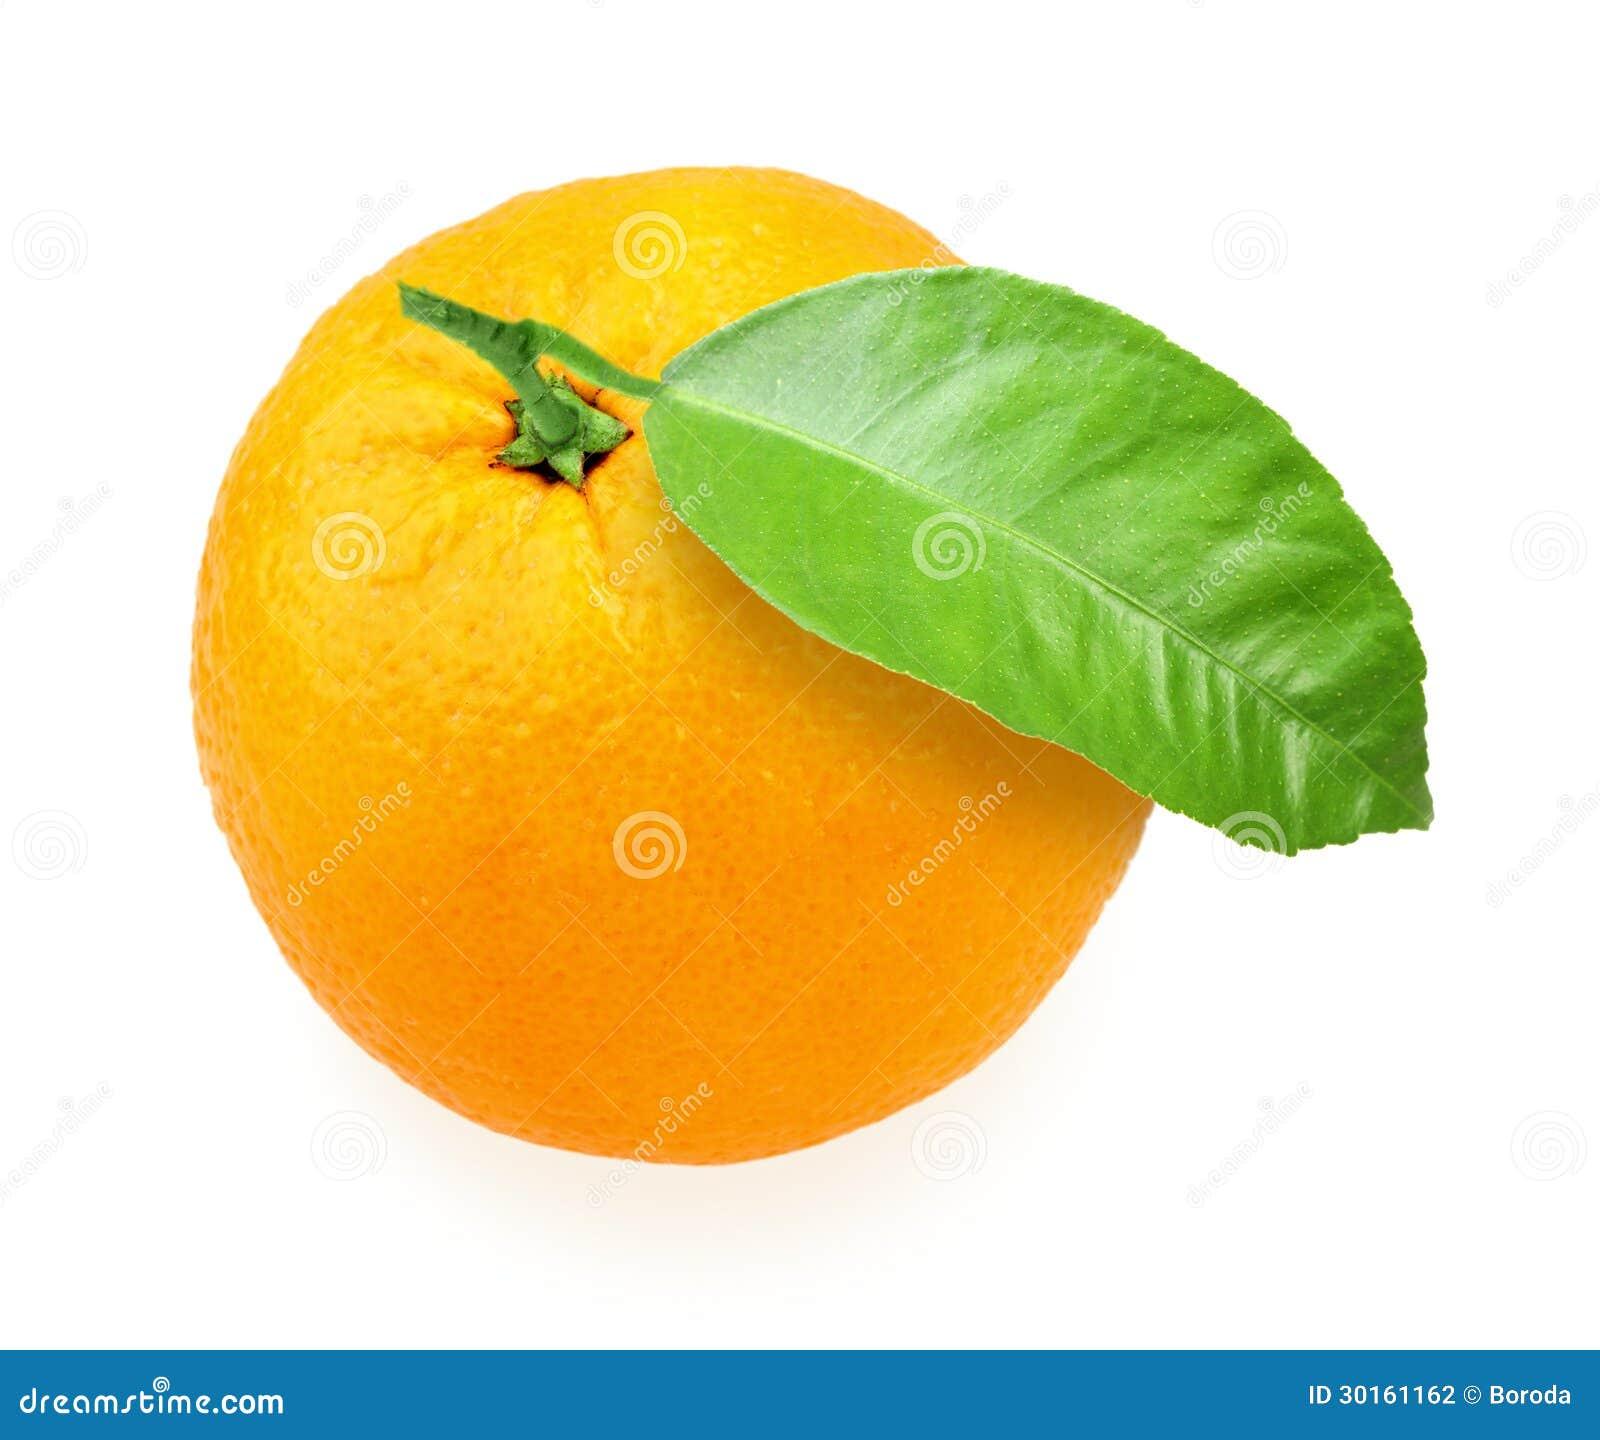 orange fruit avec la feuille verte photographie stock image 30161162. Black Bedroom Furniture Sets. Home Design Ideas